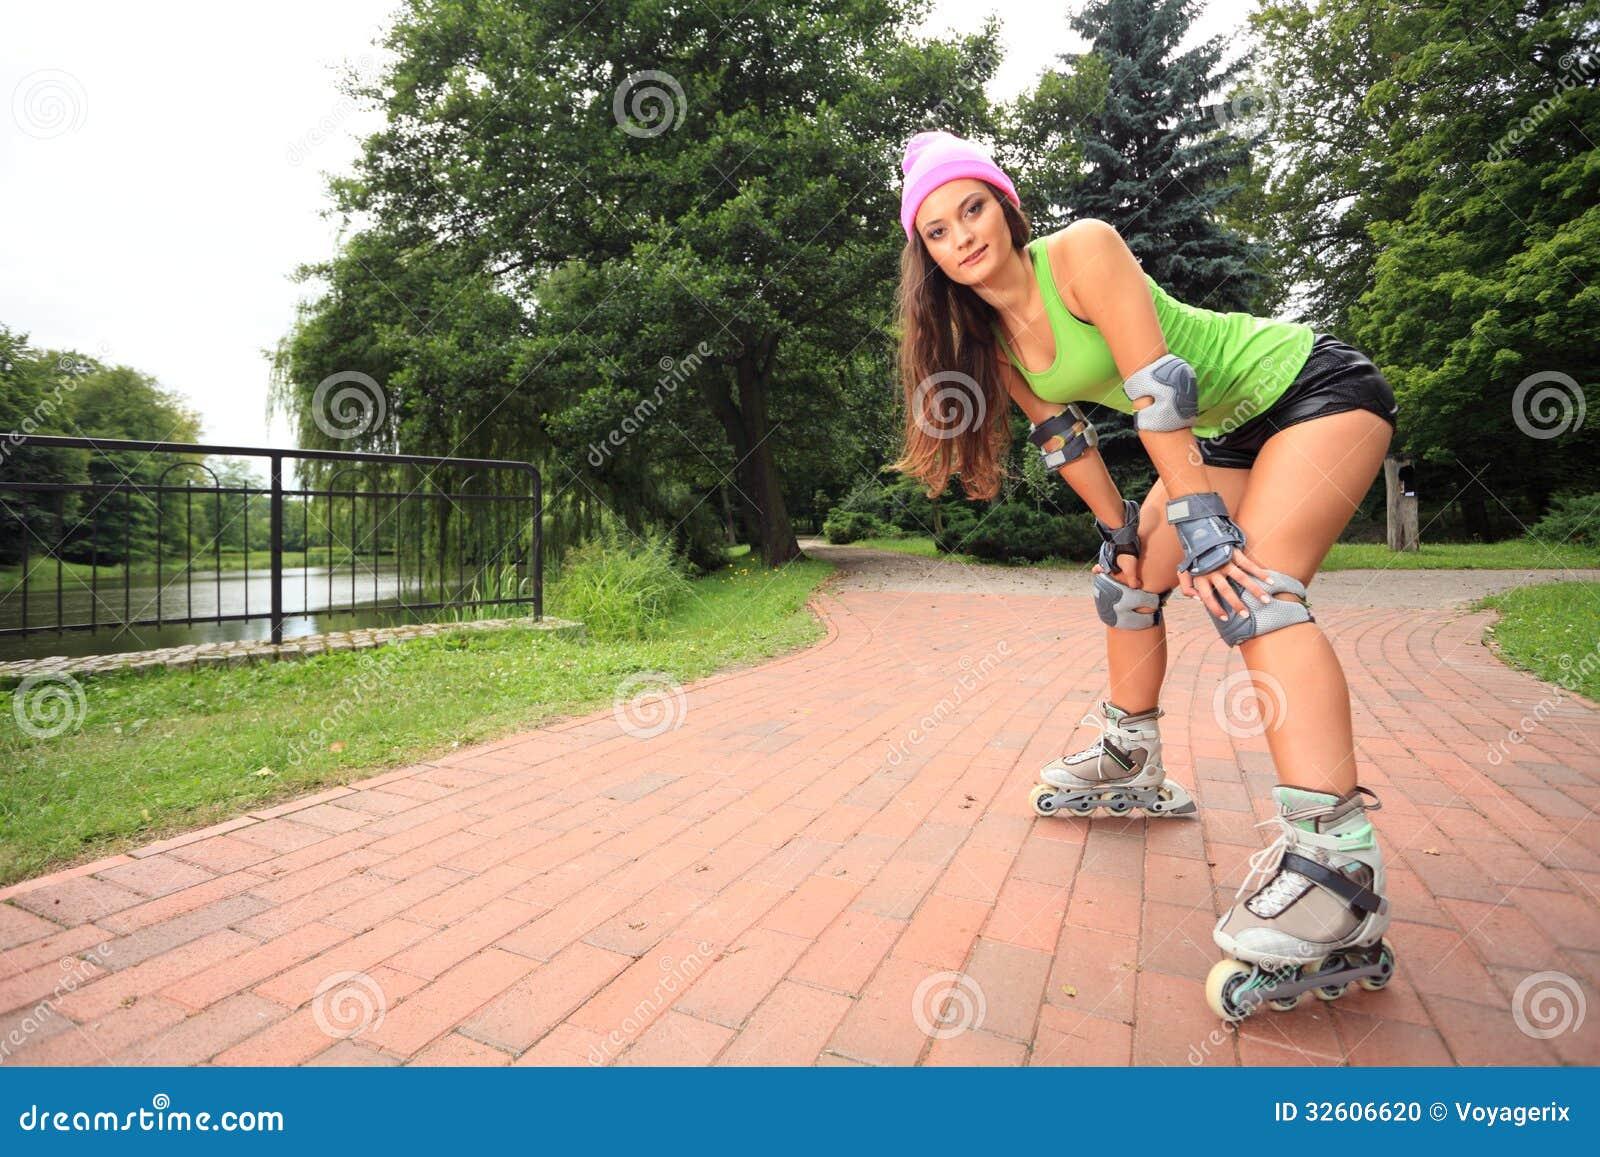 Woman Inline Skating Wiring Diagrams Simple Event Counter Circuit Diagram Tradeoficcom Roller Sport Activity In Park Stock Photo Hockey Cartoon